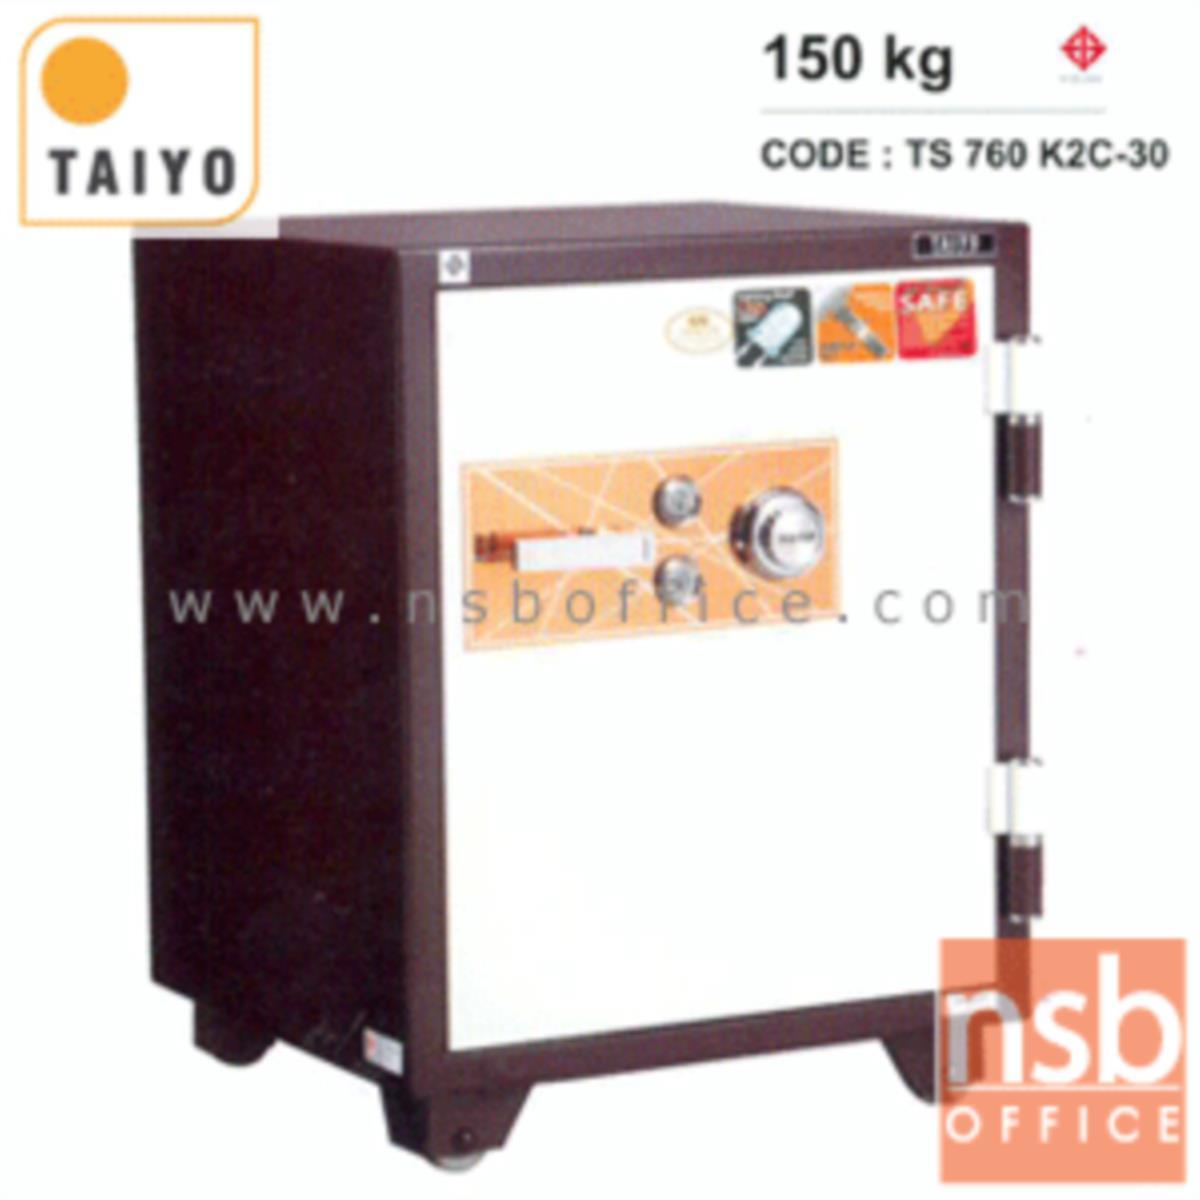 F01A036:ตู้เซฟ TAIYO รุ่น 150 กก. 2 กุญแจ 1 รหัส (TS760K2C-30)